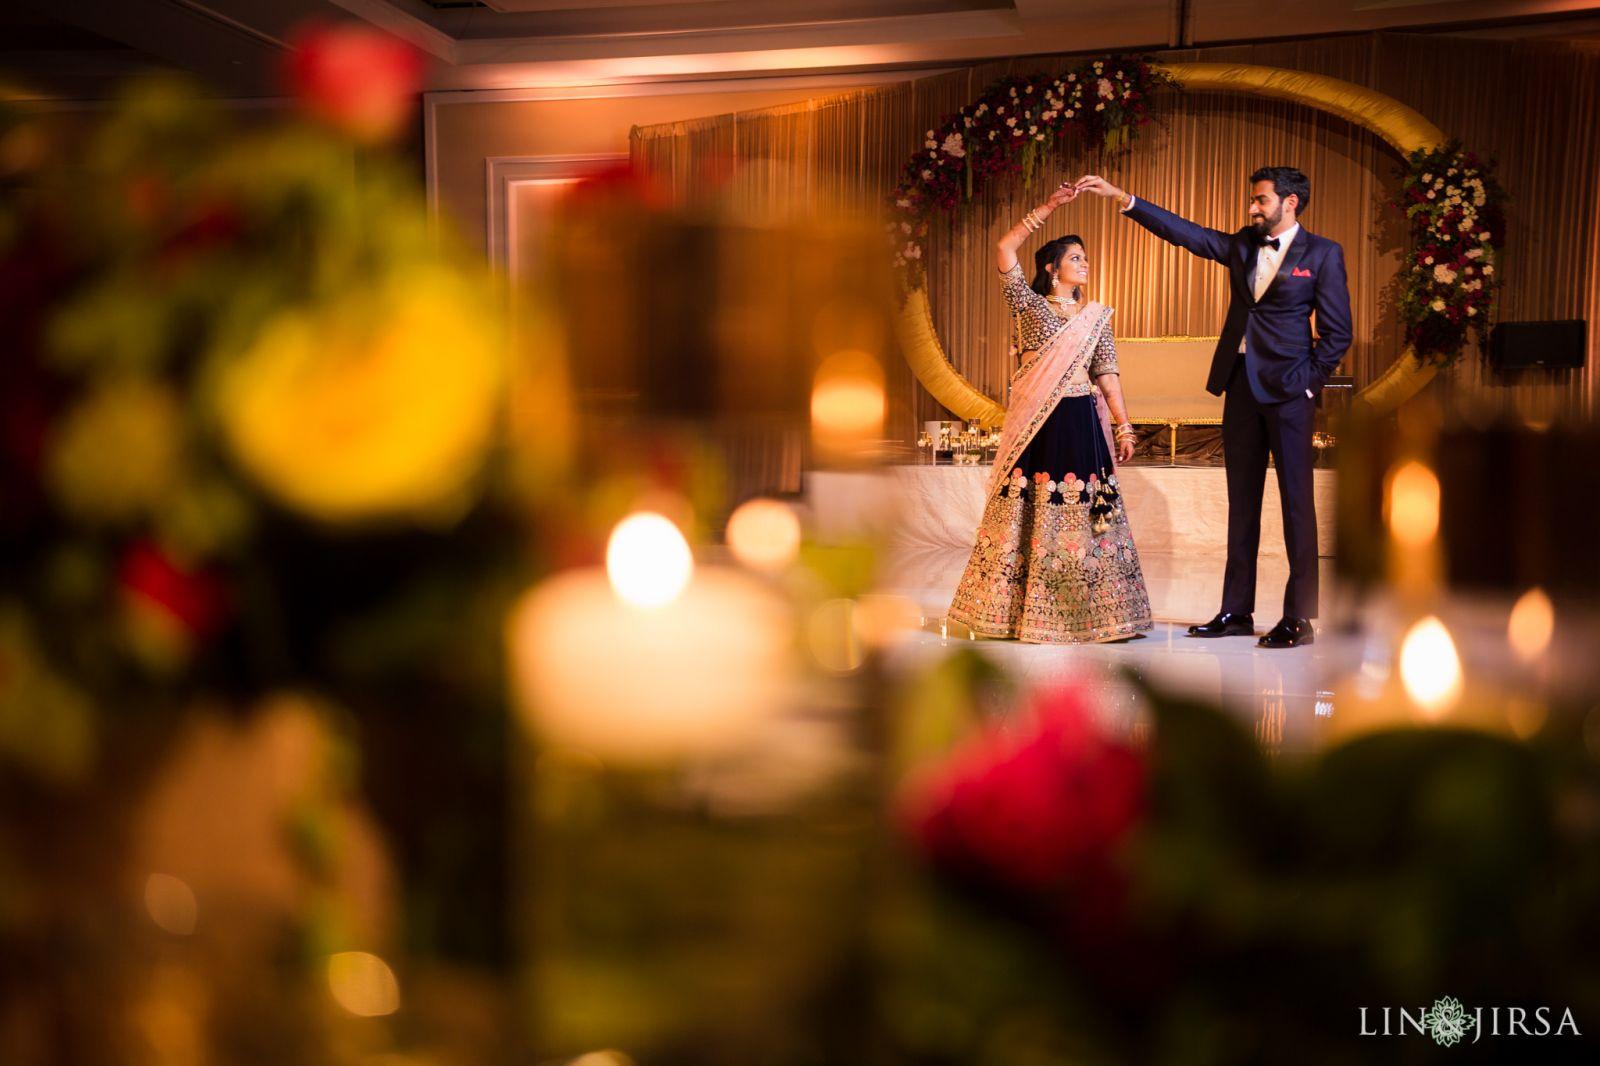 kismet-wedding-inspiration-pics-69.jpg